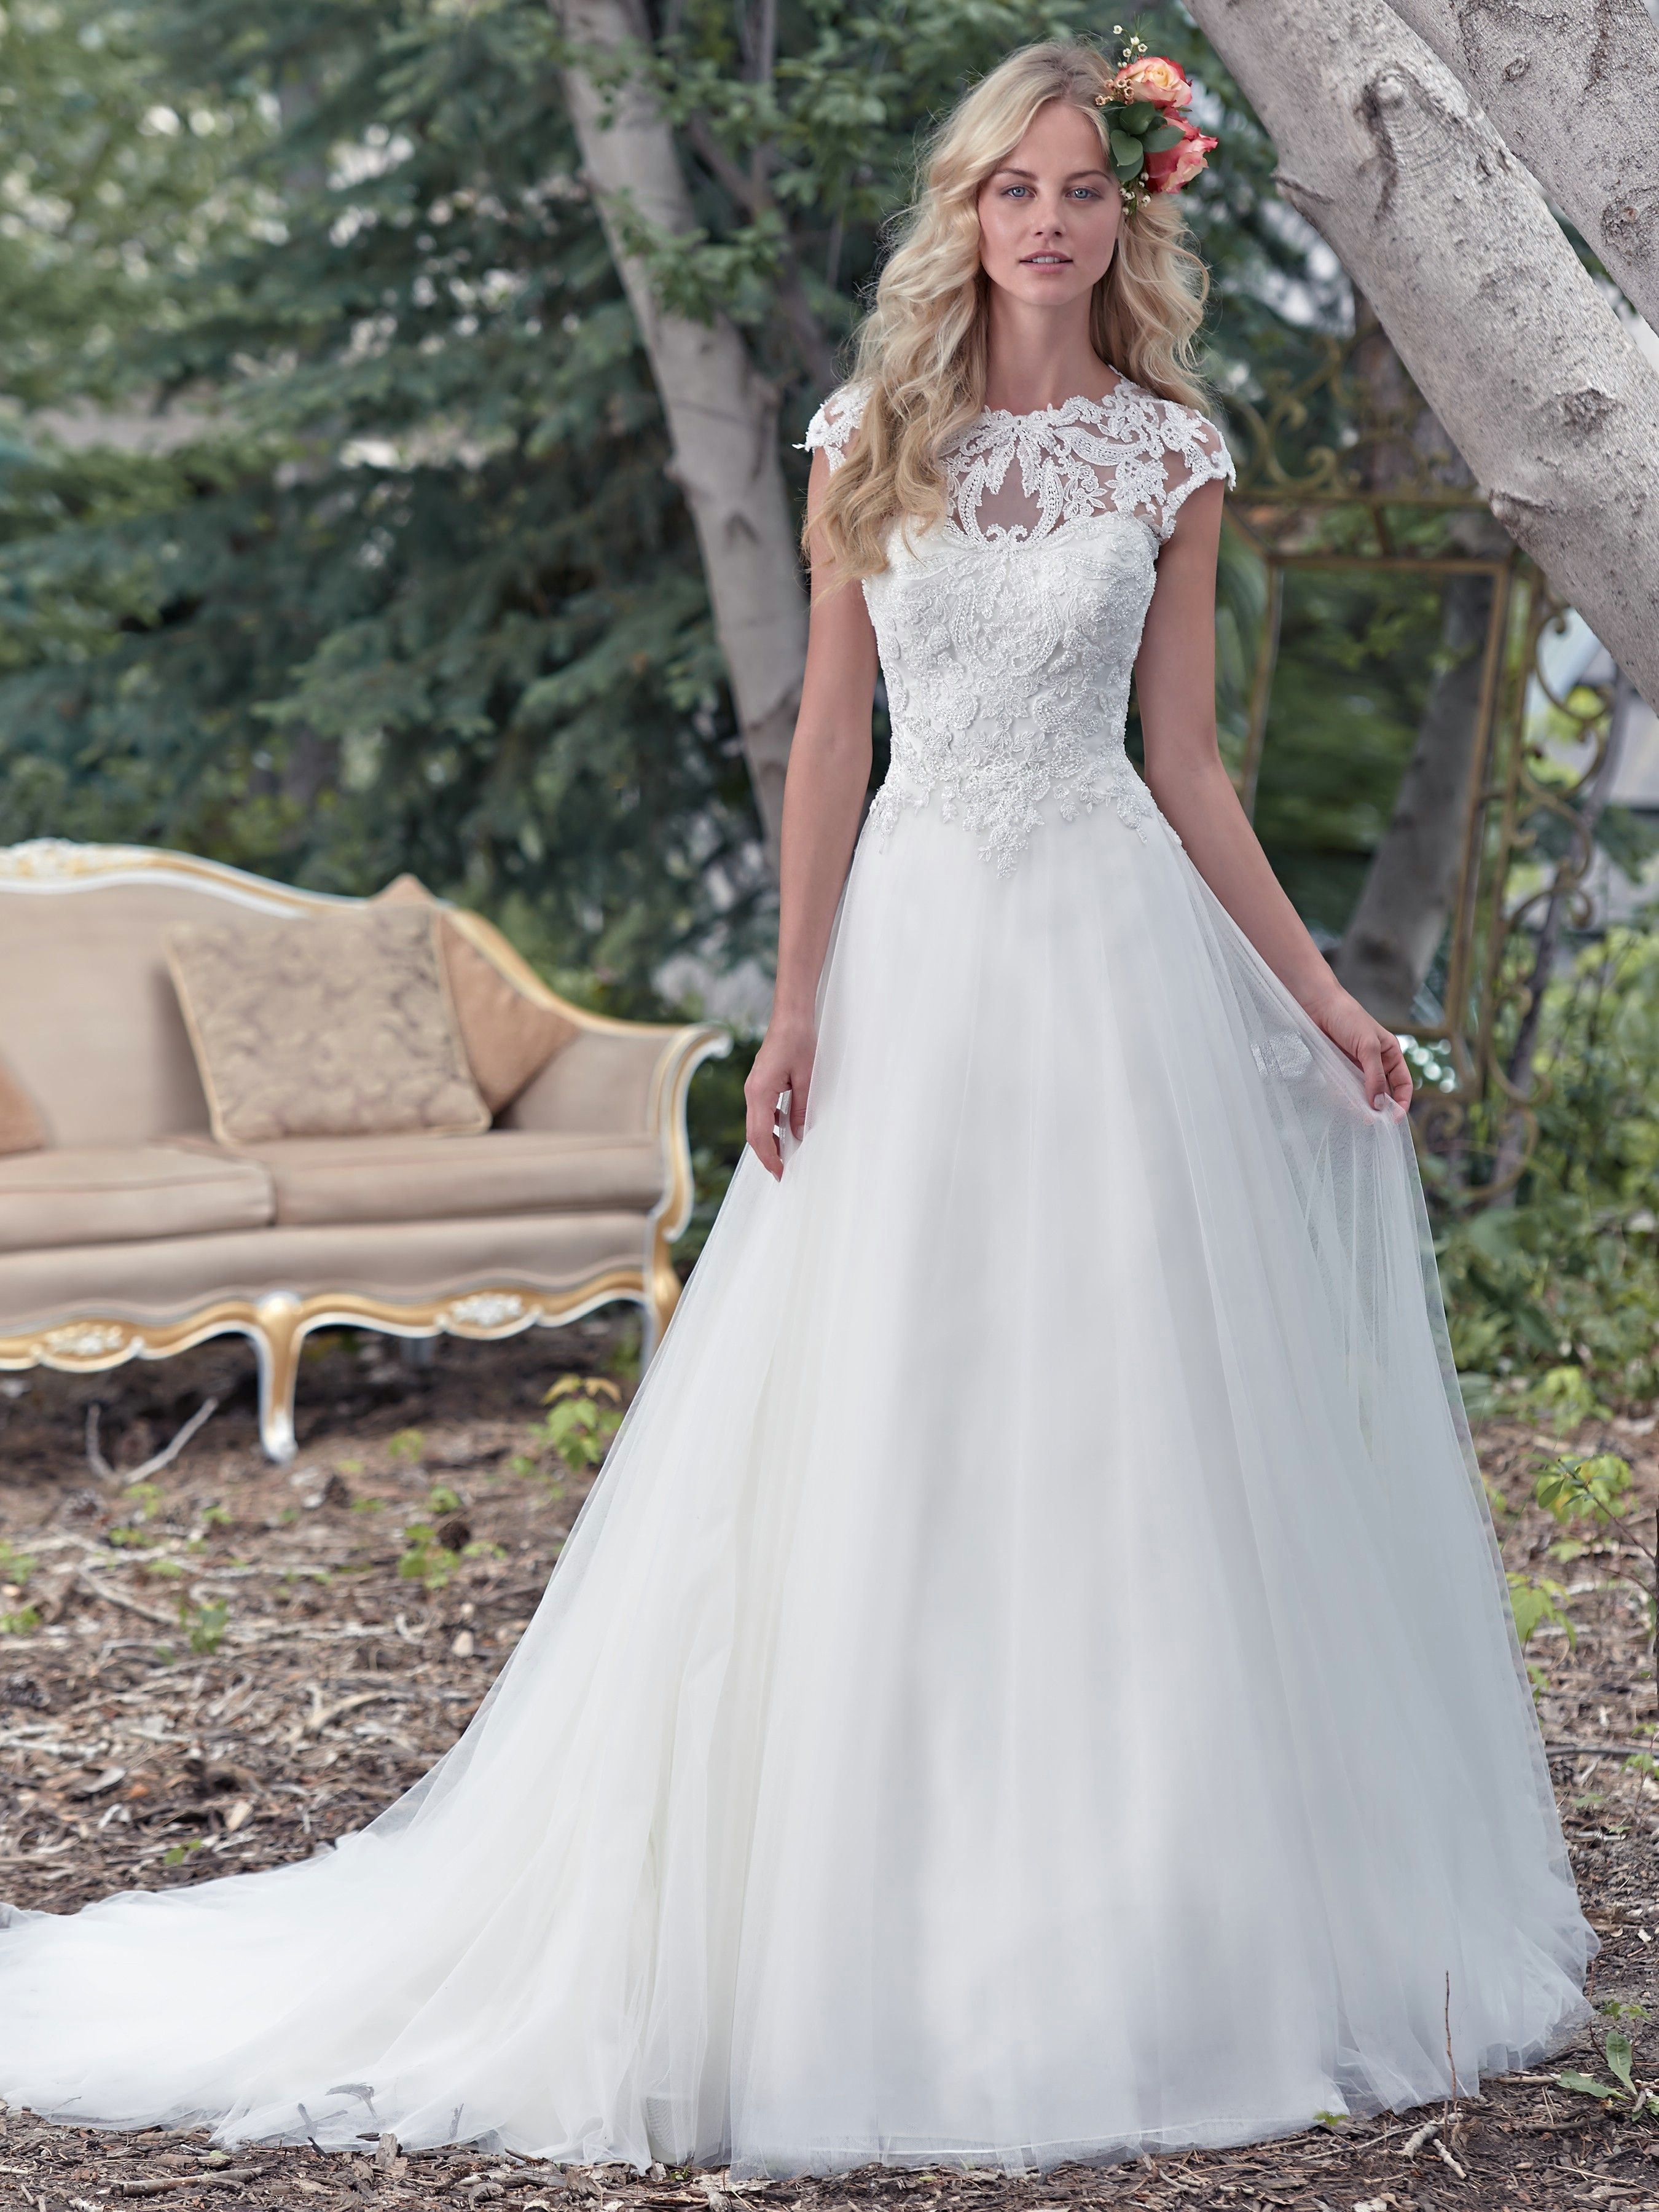 tank top wedding dresses Wedding Dresses Bridesmaid Dresses Prom Dresses and Bridal Dresses Maggie Sottero Wedding Dresses